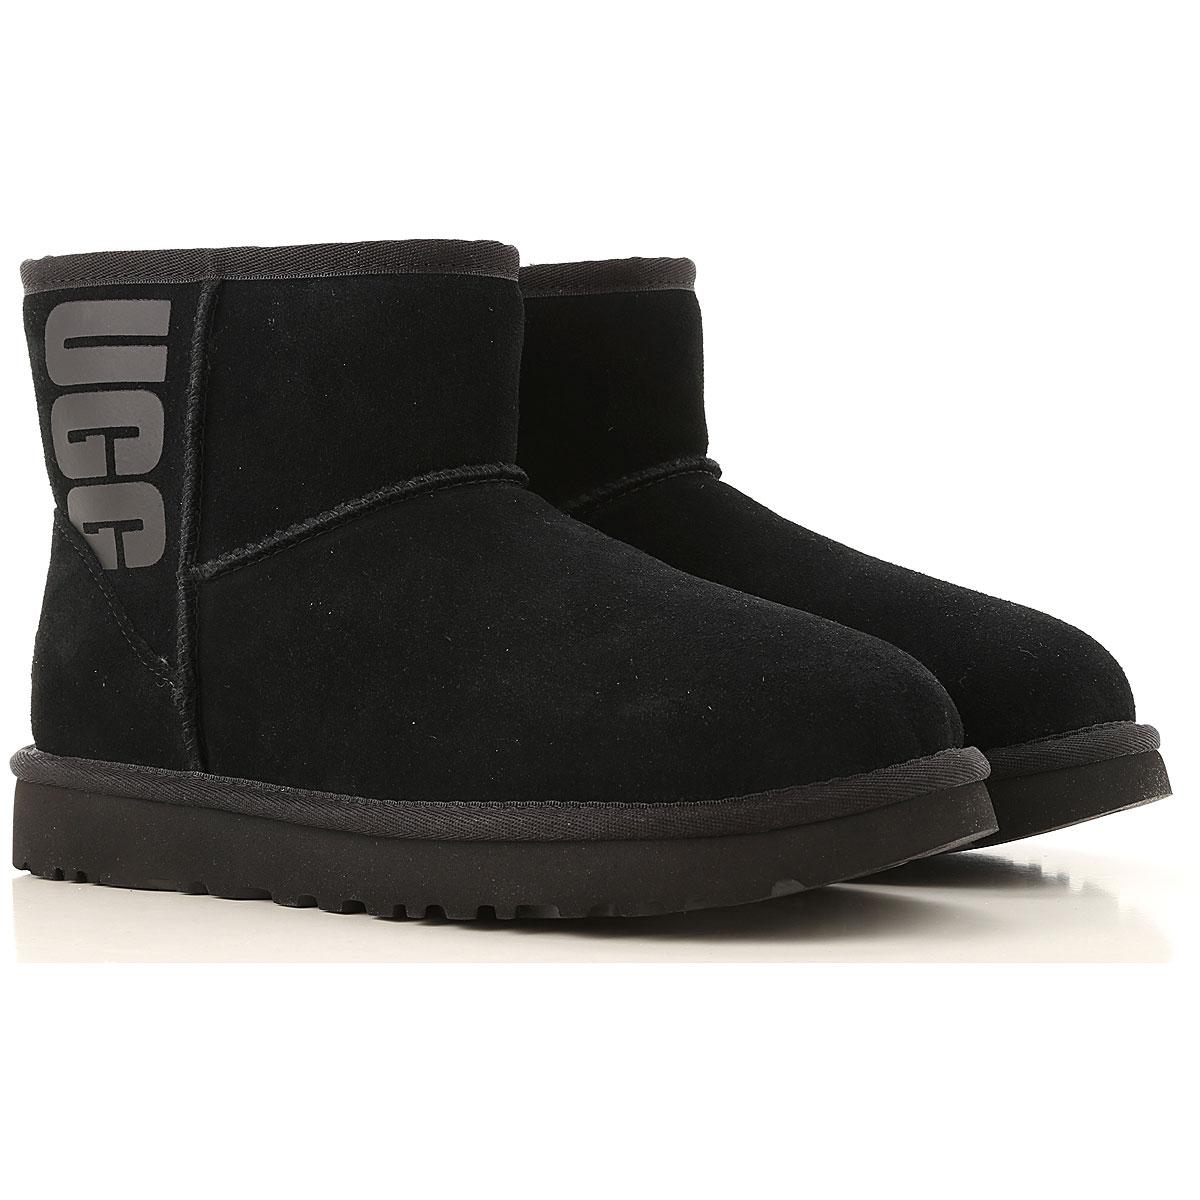 UGG Boots for Women, Booties On Sale, black, Recycled Polyester, 2019, USA 5 UK 3 5 EU 36 JAPAN 220 USA 6 UK 4 5 EU 37 JAPAN 230 USA 7 UK 5 5